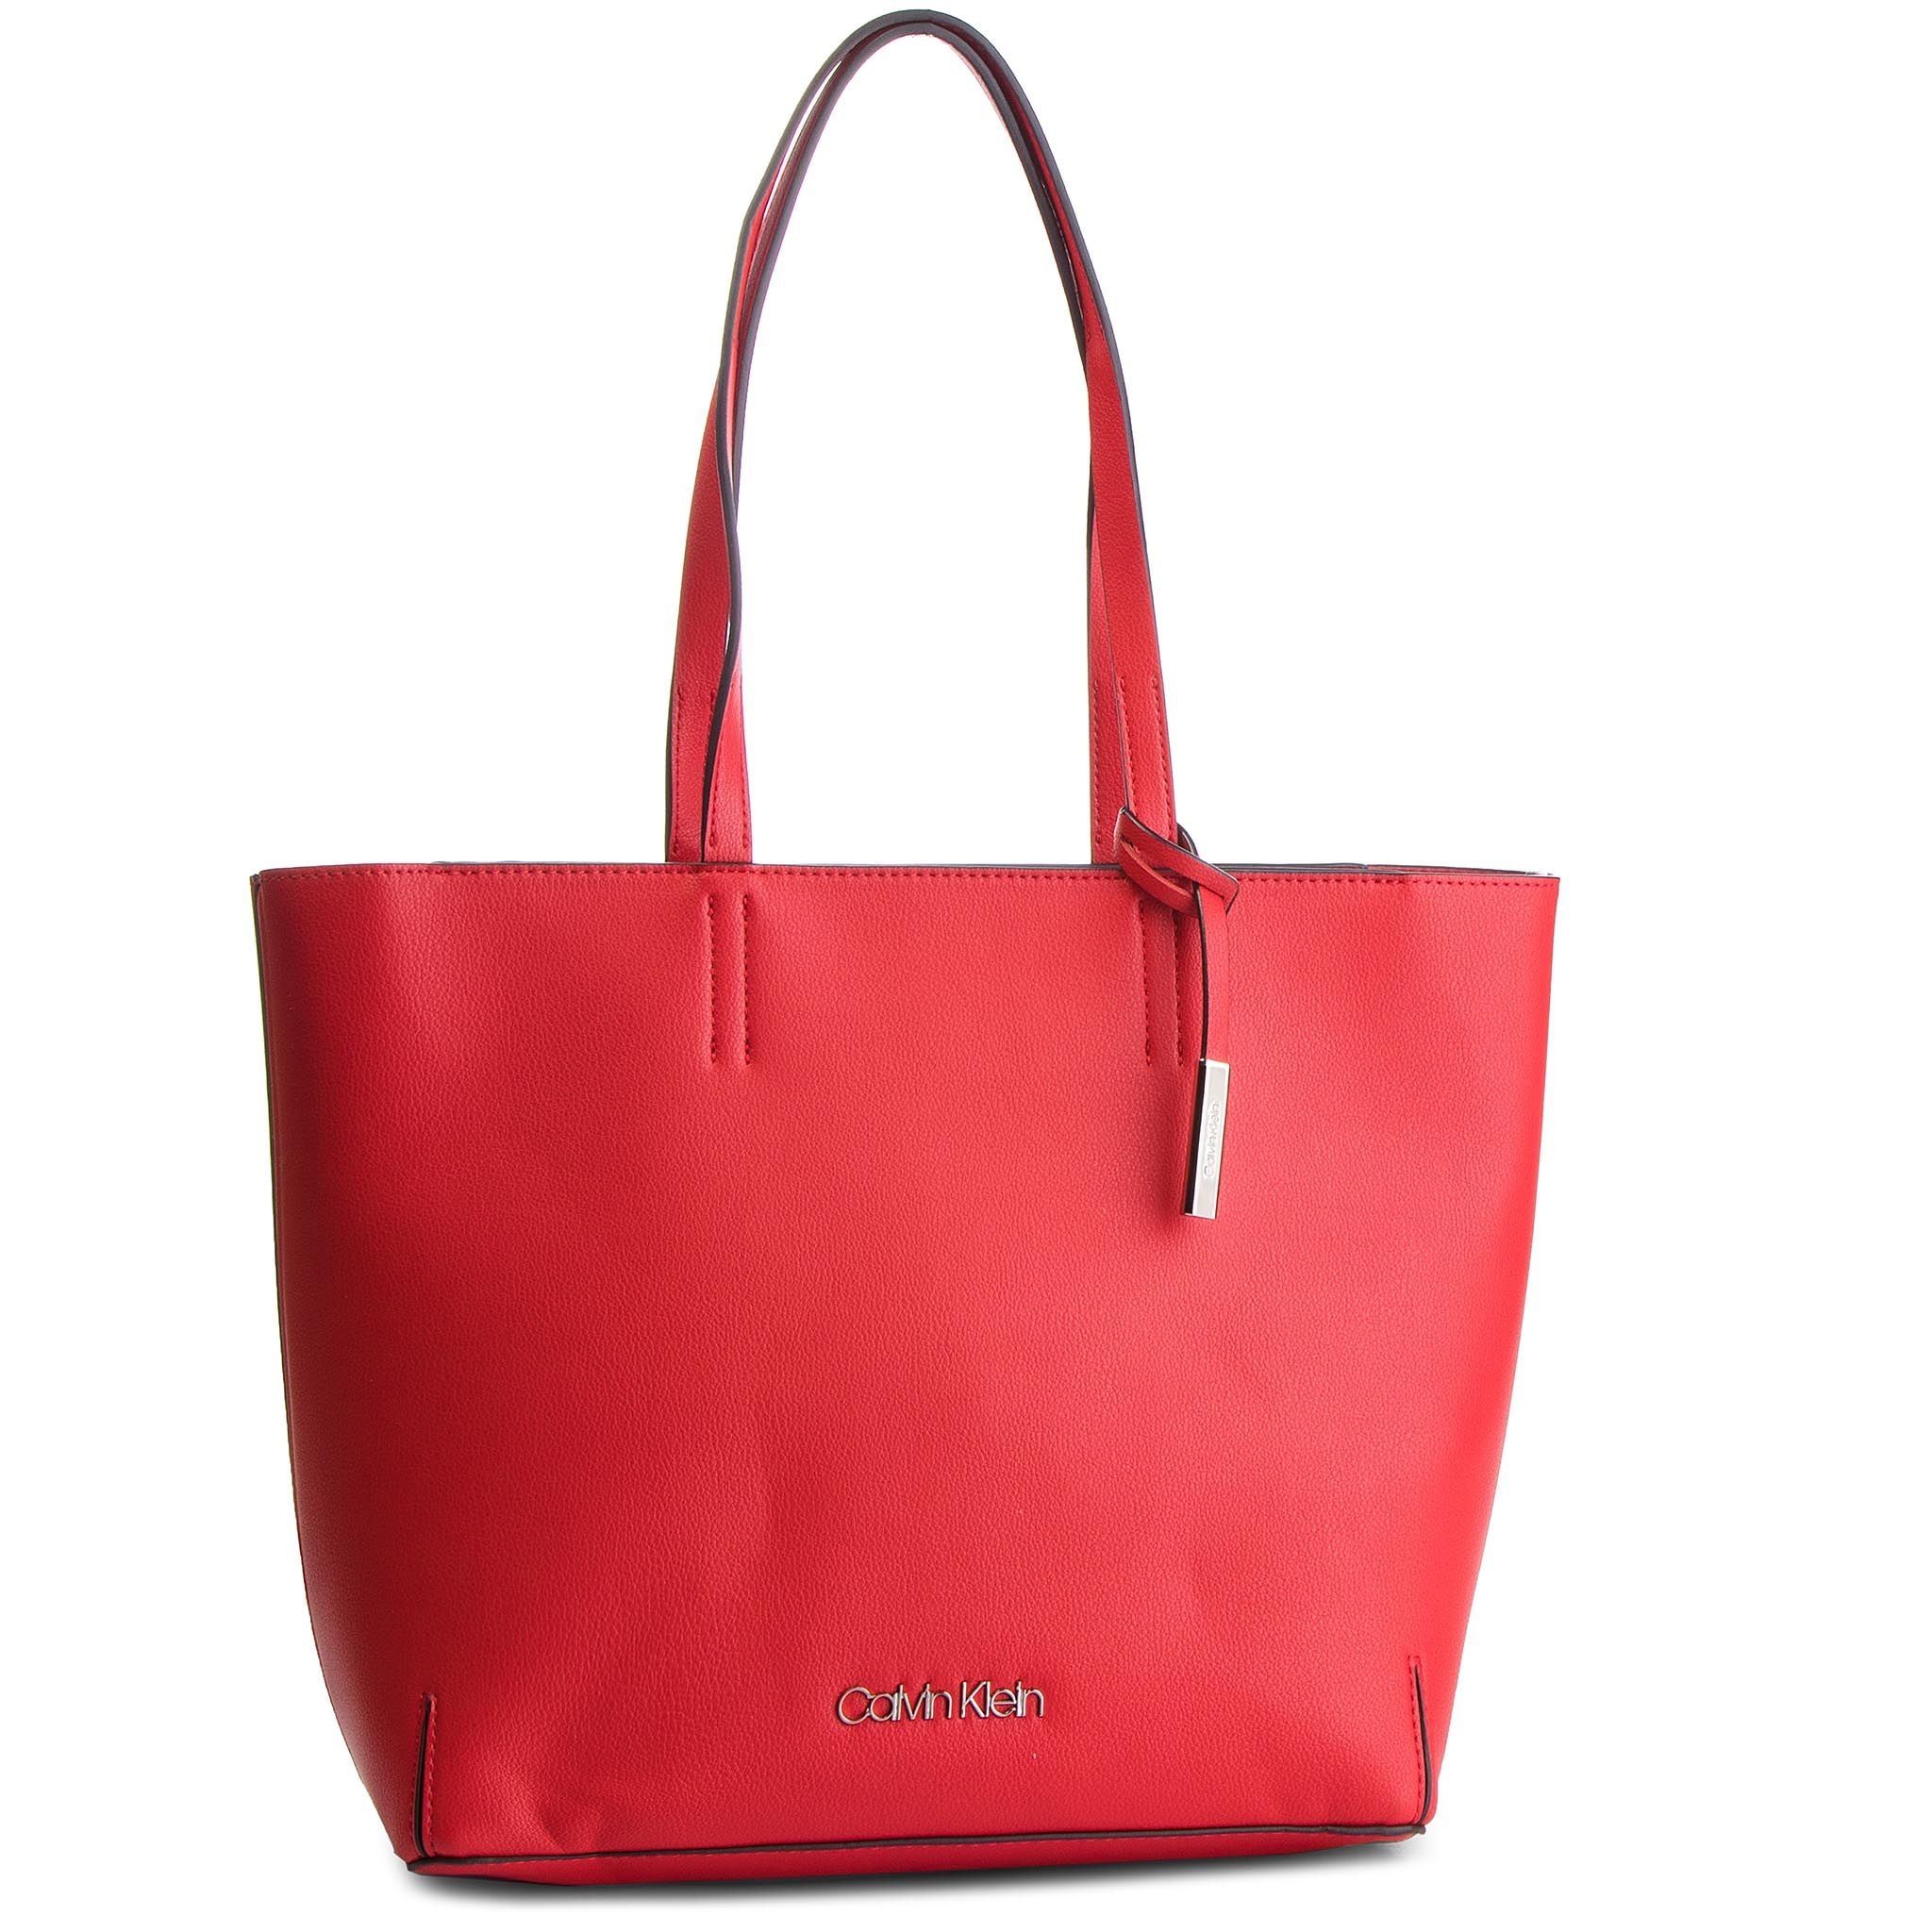 5ac1312a09 ... CALVIN KLEIN - Stitch Ew Shopper K60K604844 640. -20%. Kabelka ...